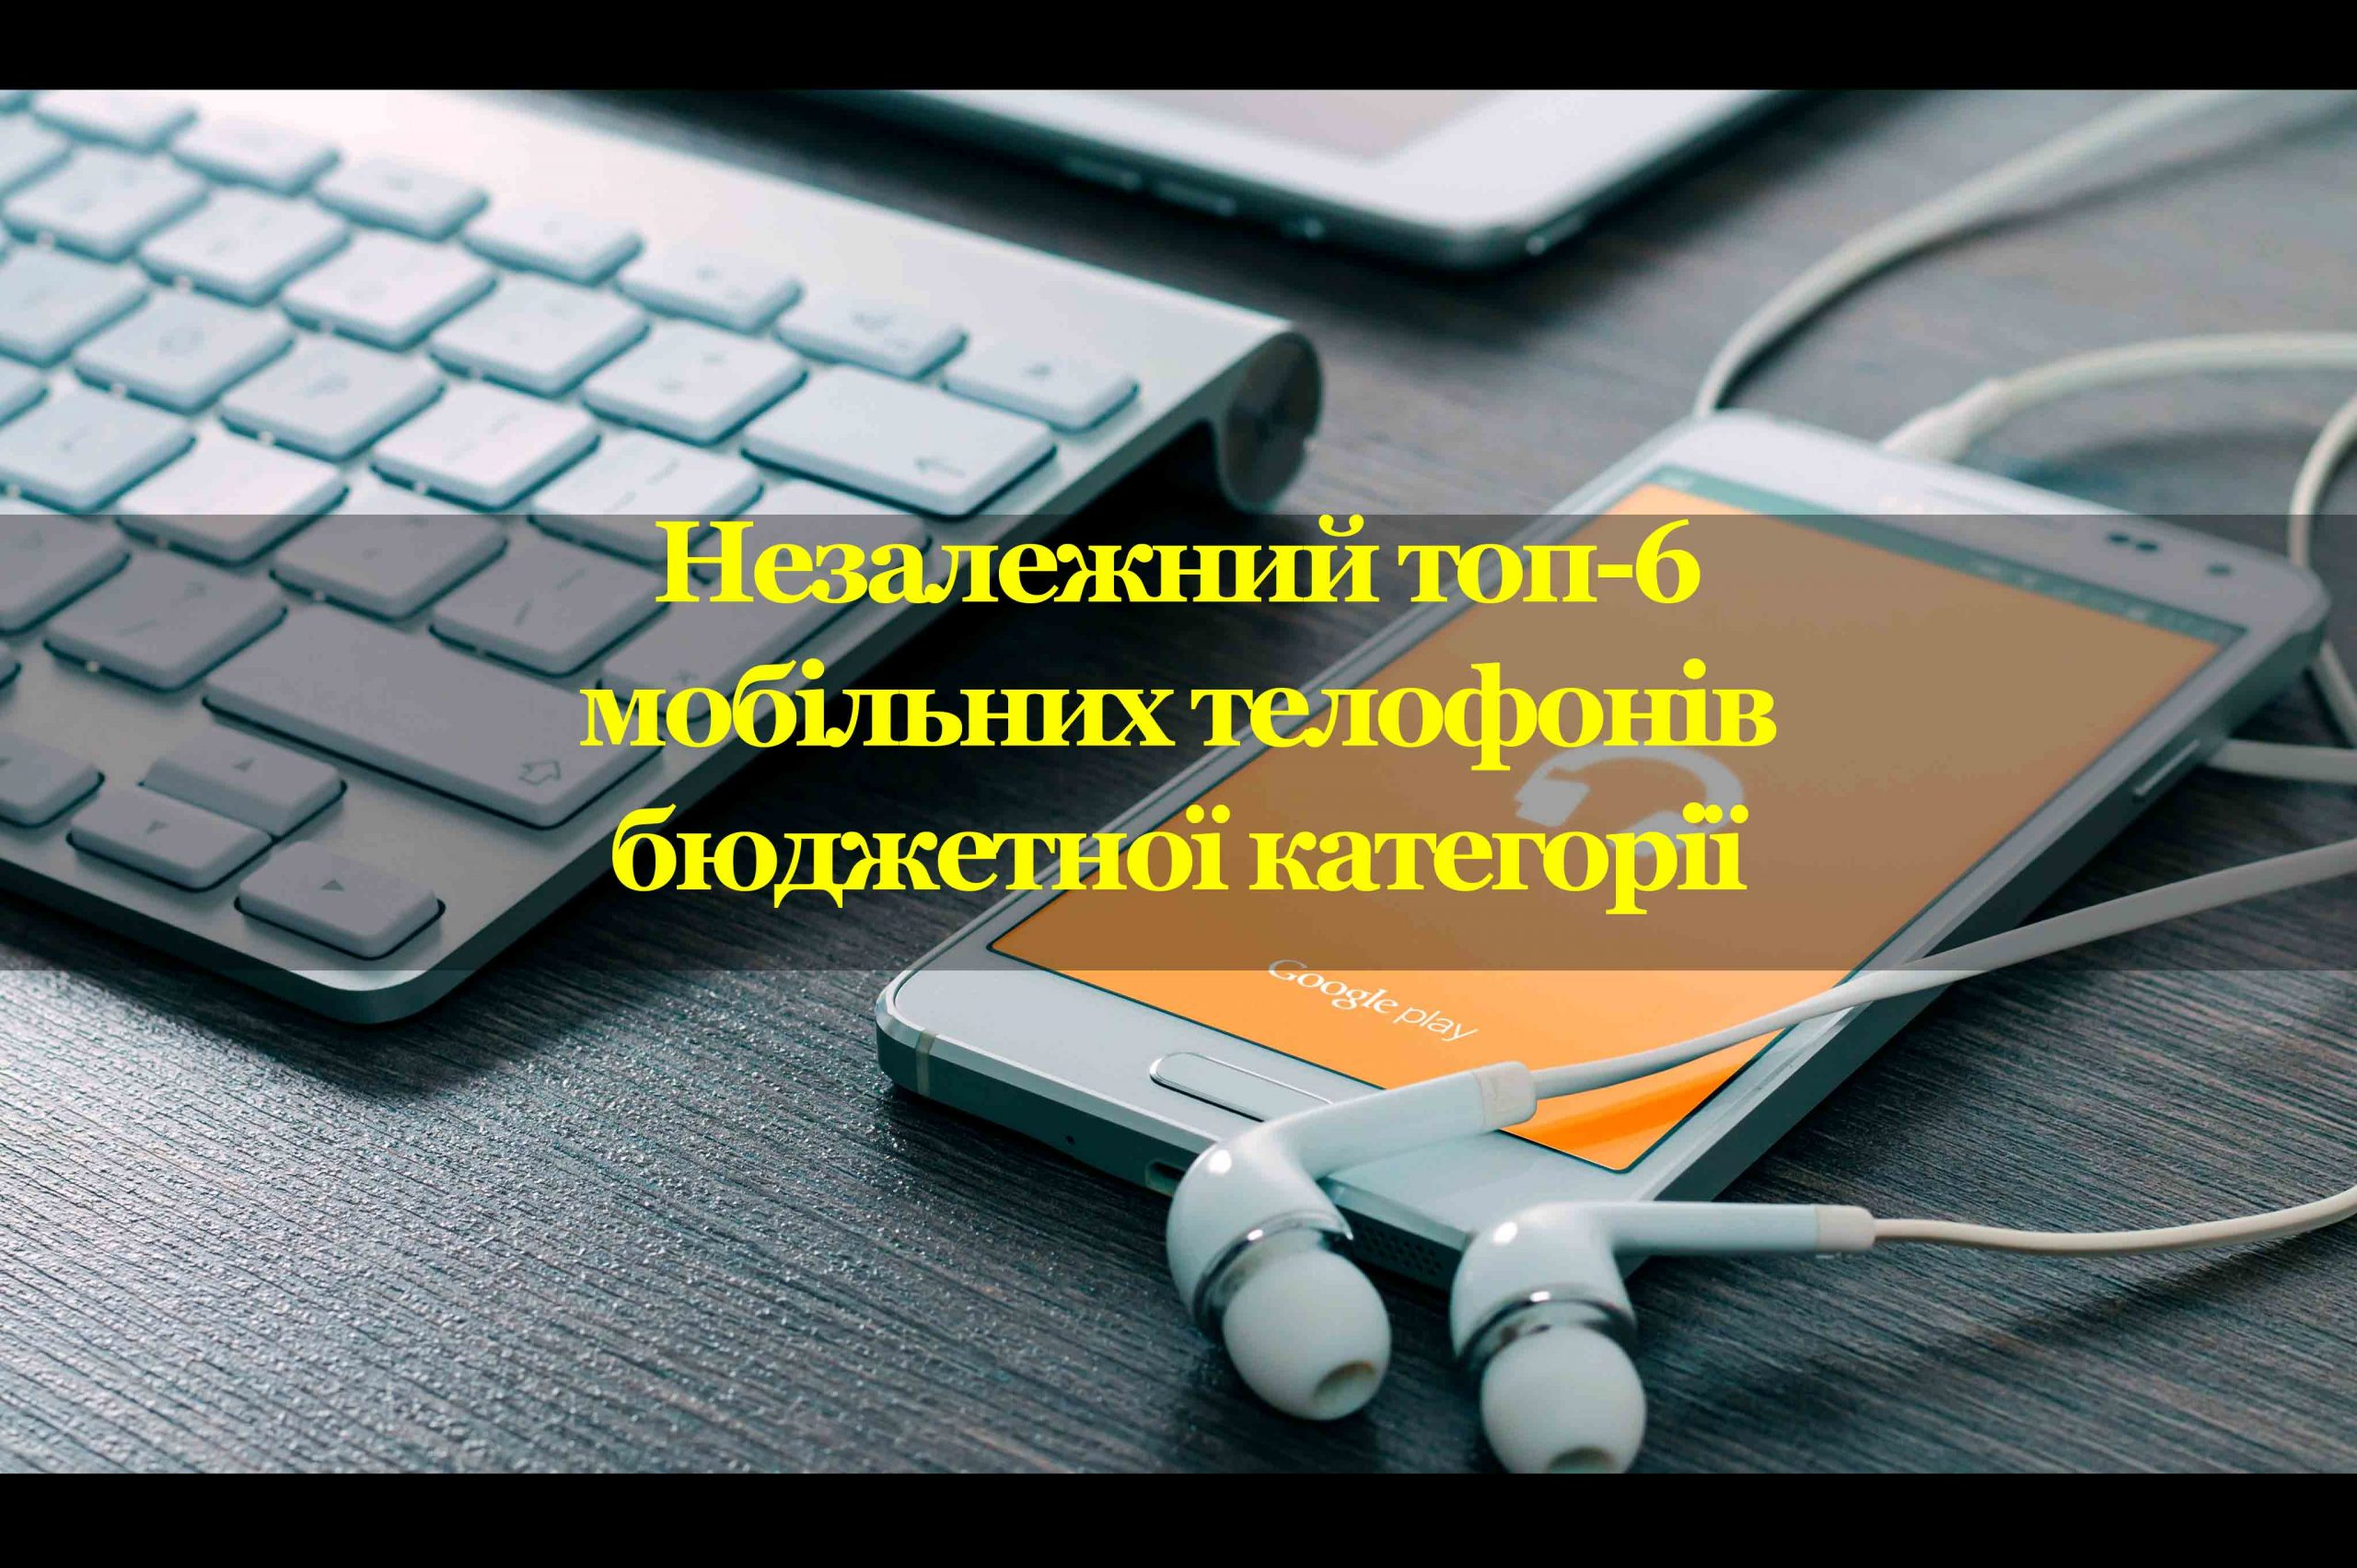 Обложка-материала_моб_телефони - фото